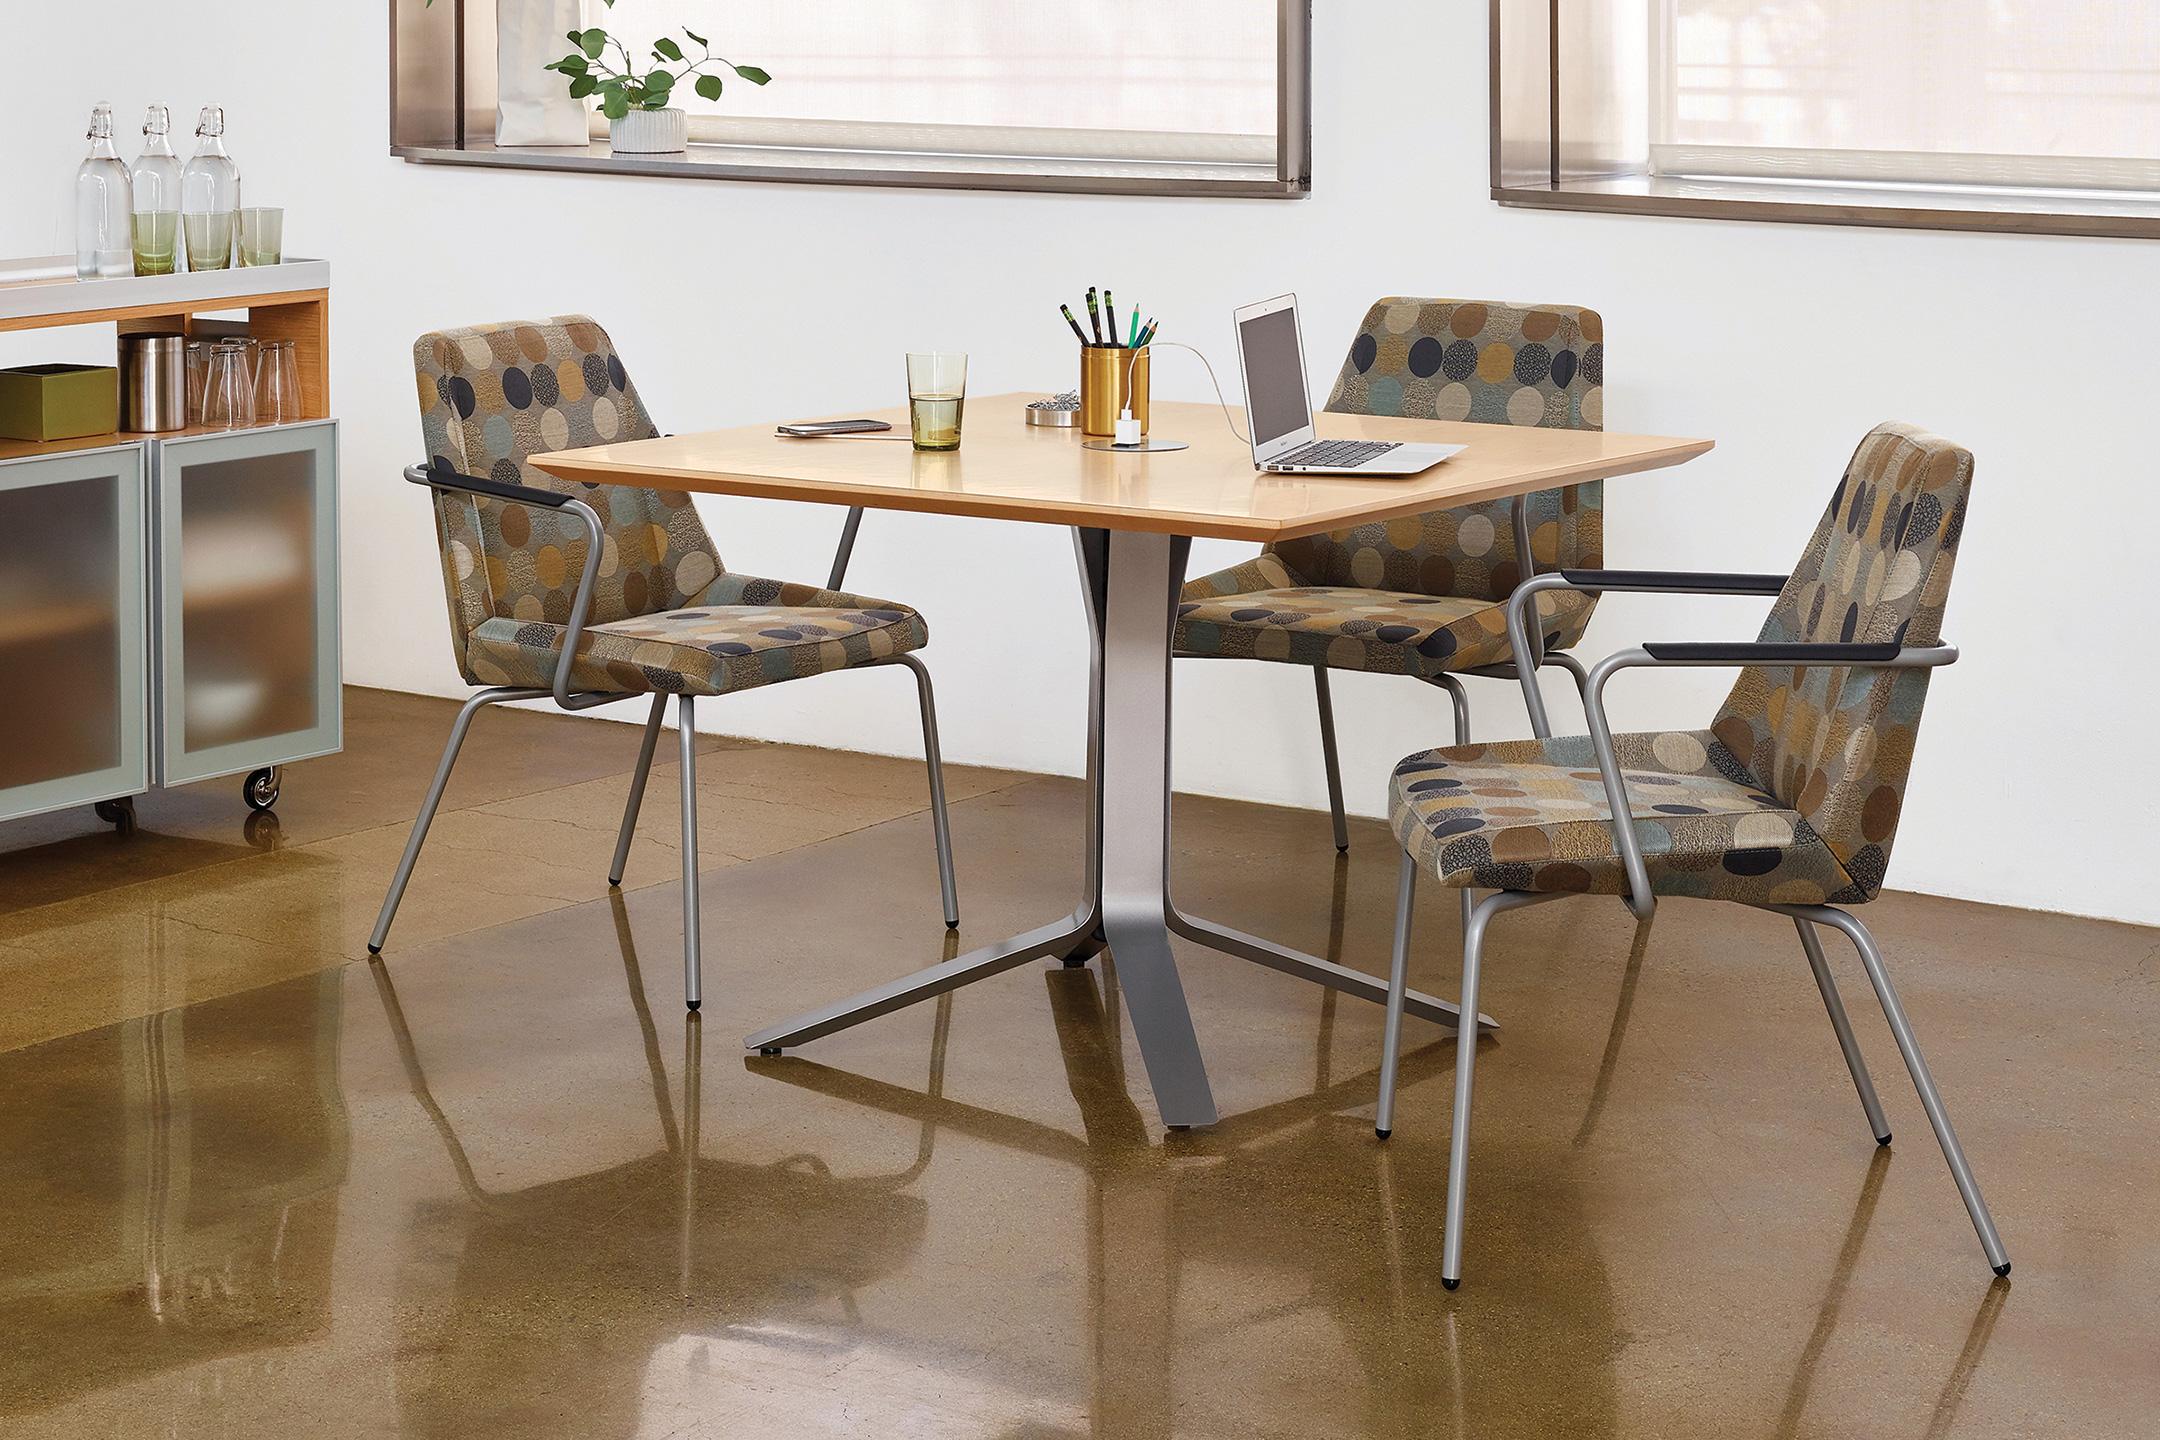 RMD_Vero-Meeting-Table_Nios-Guest_2160x1440.jpg